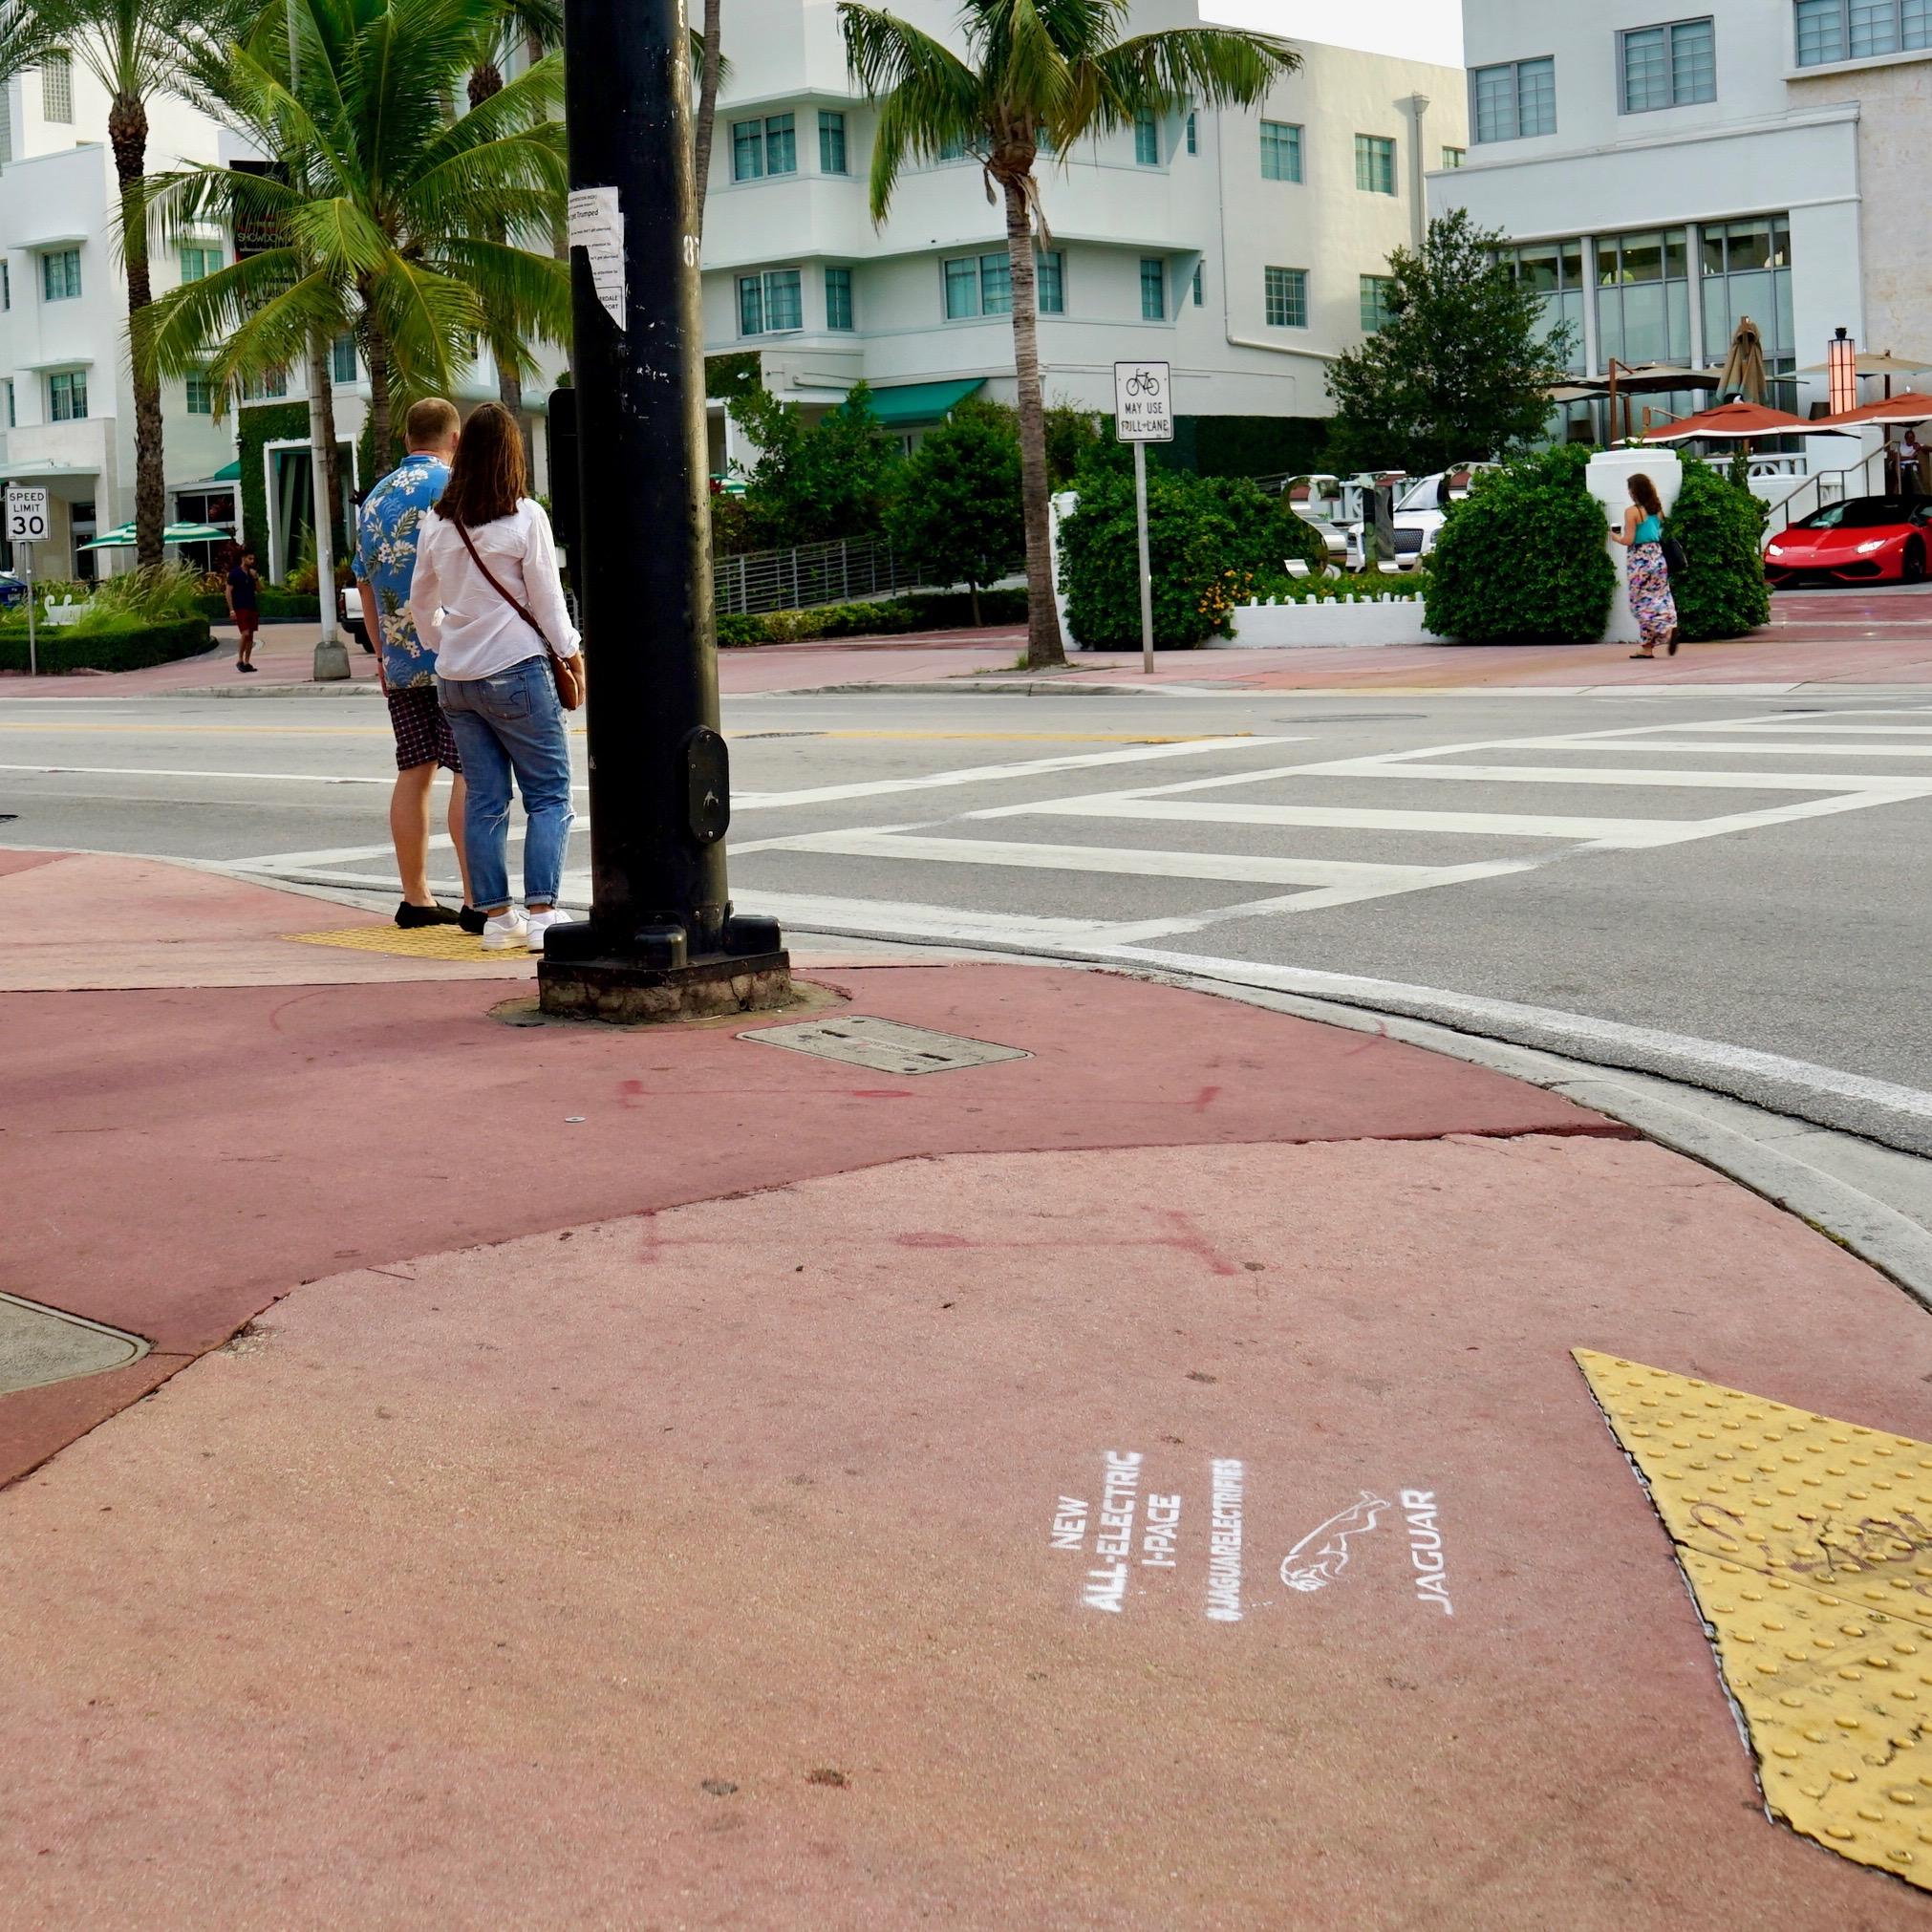 2018_10_7_COM_JaguarStencils_Miami_014.jpg